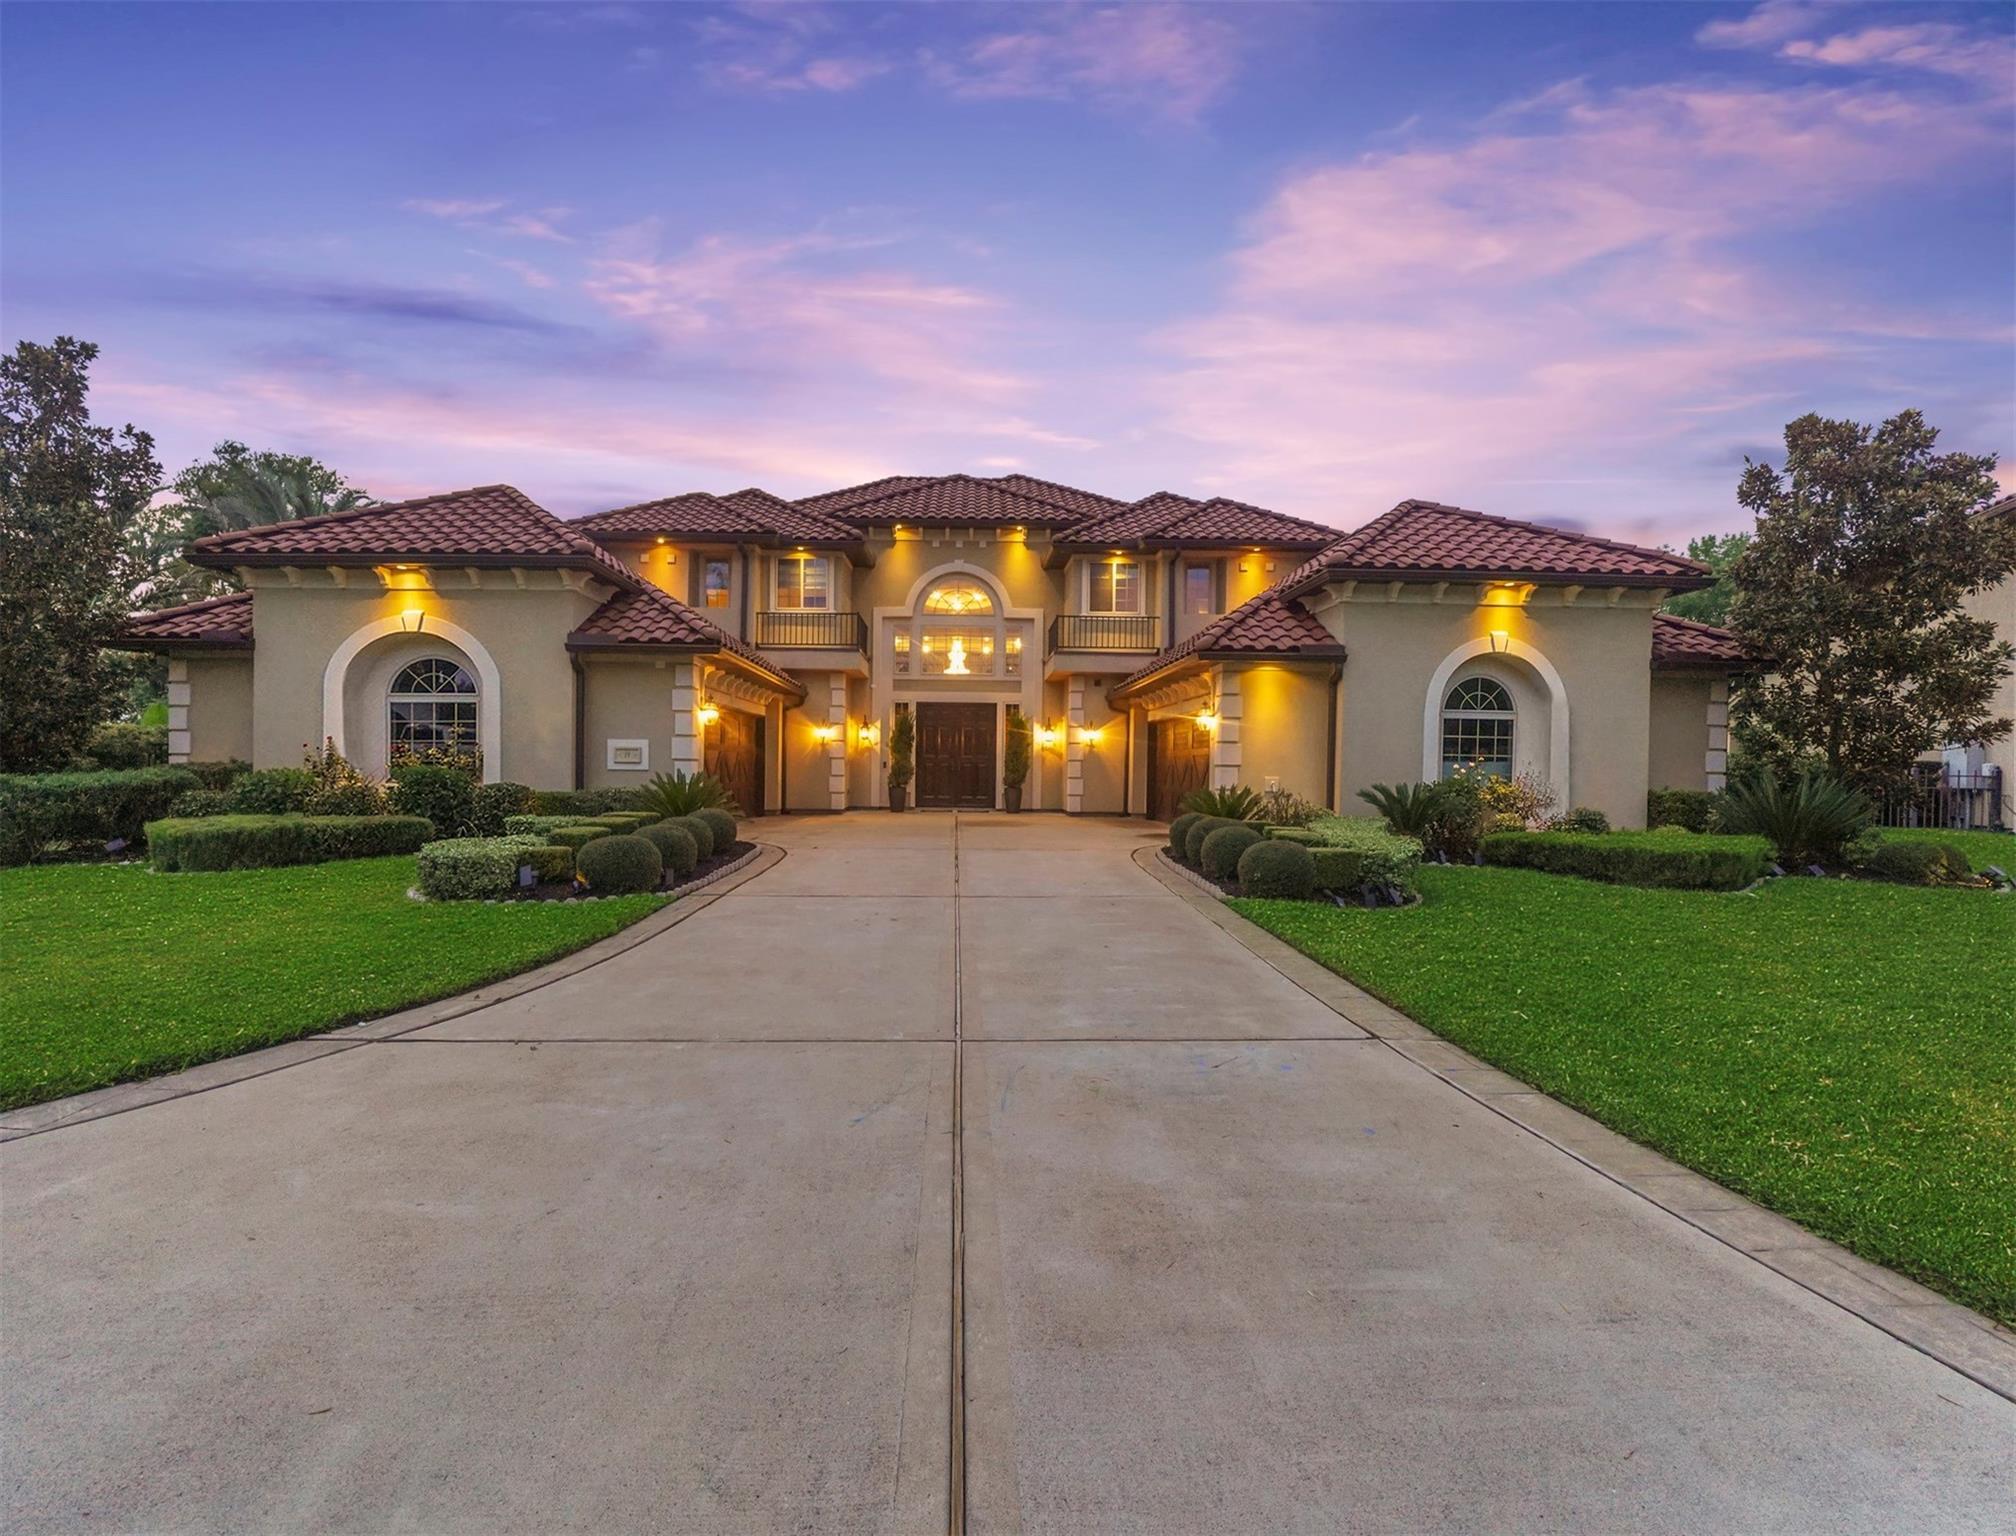 19 Sanctuary Trail Property Photo - Missouri City, TX real estate listing